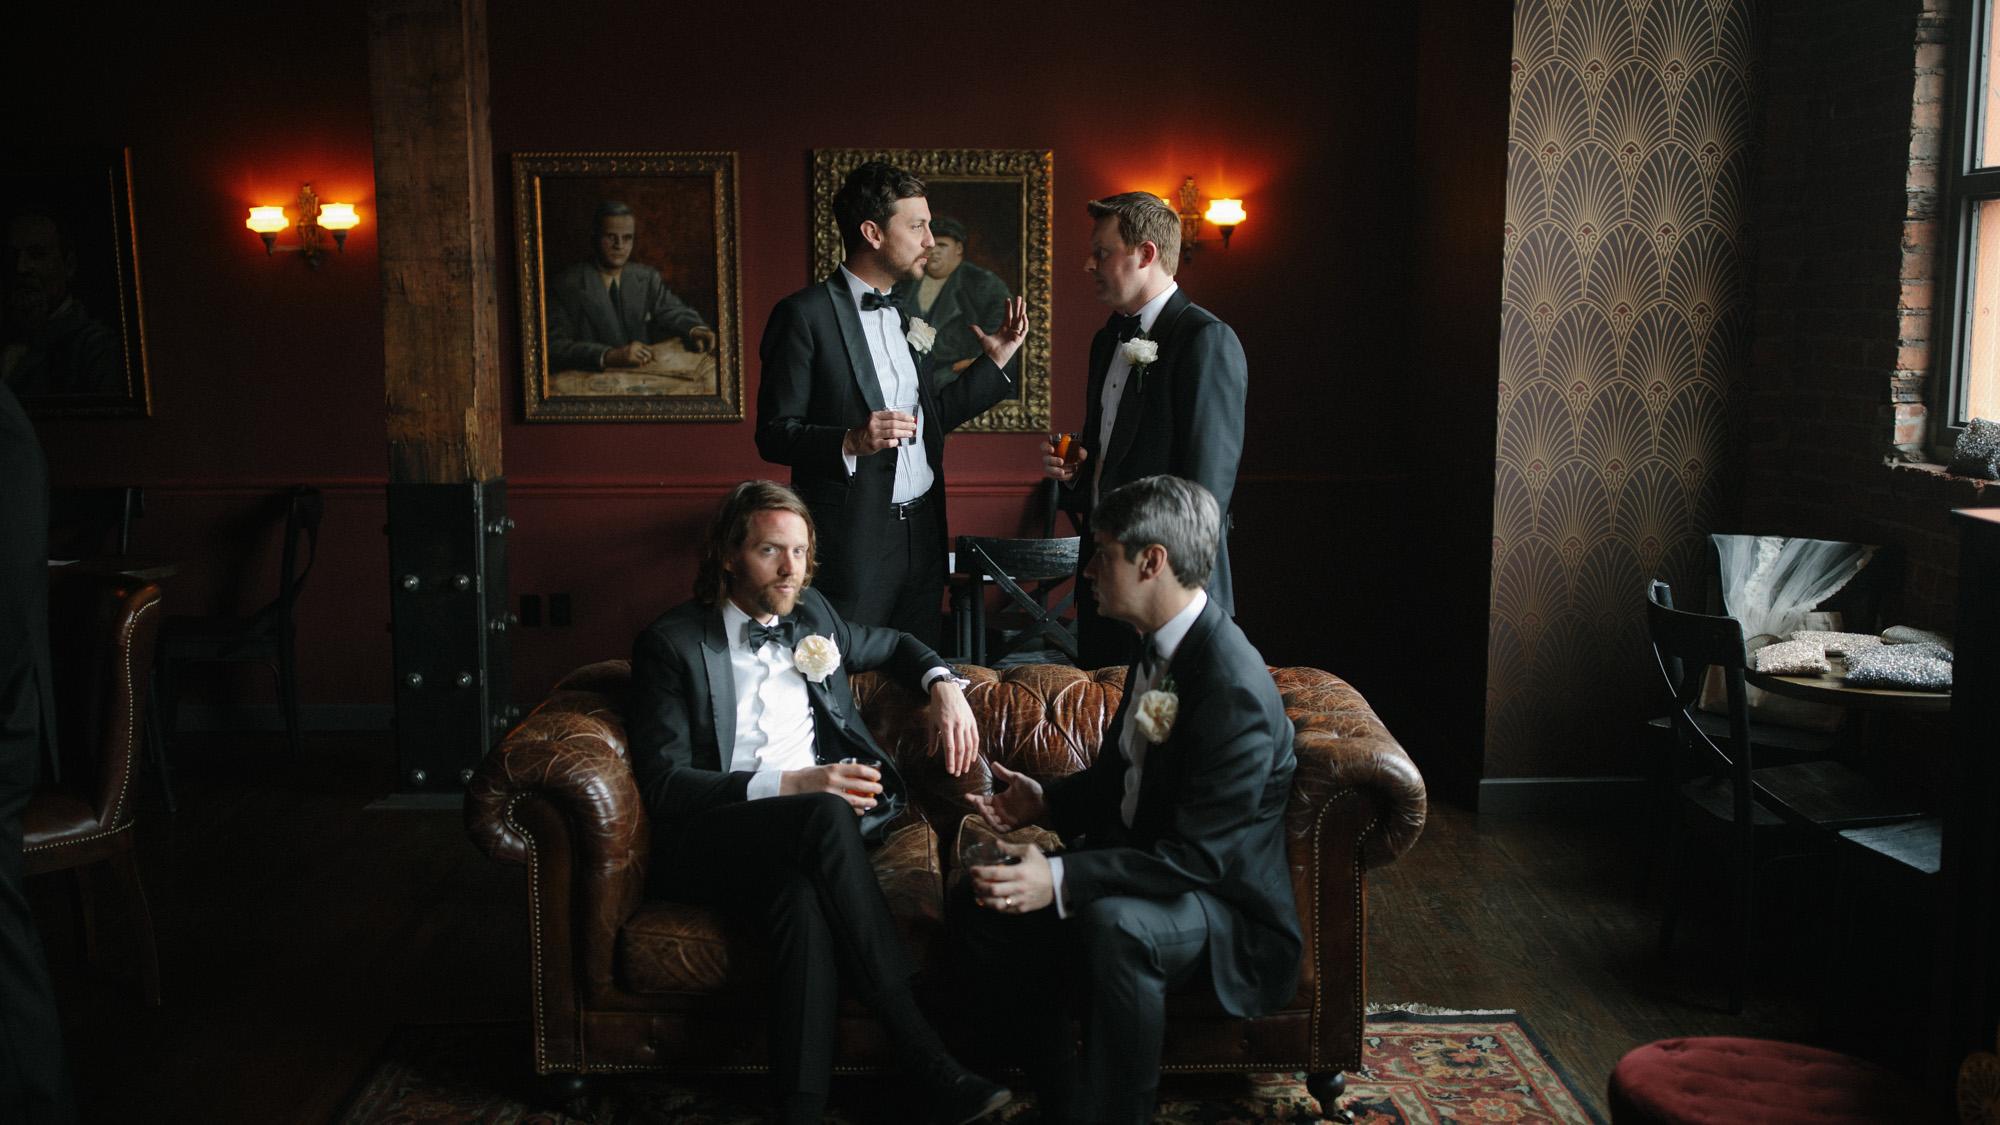 Alec_Vanderboom_kansas_city_hip_wedding_photos-0040.jpg